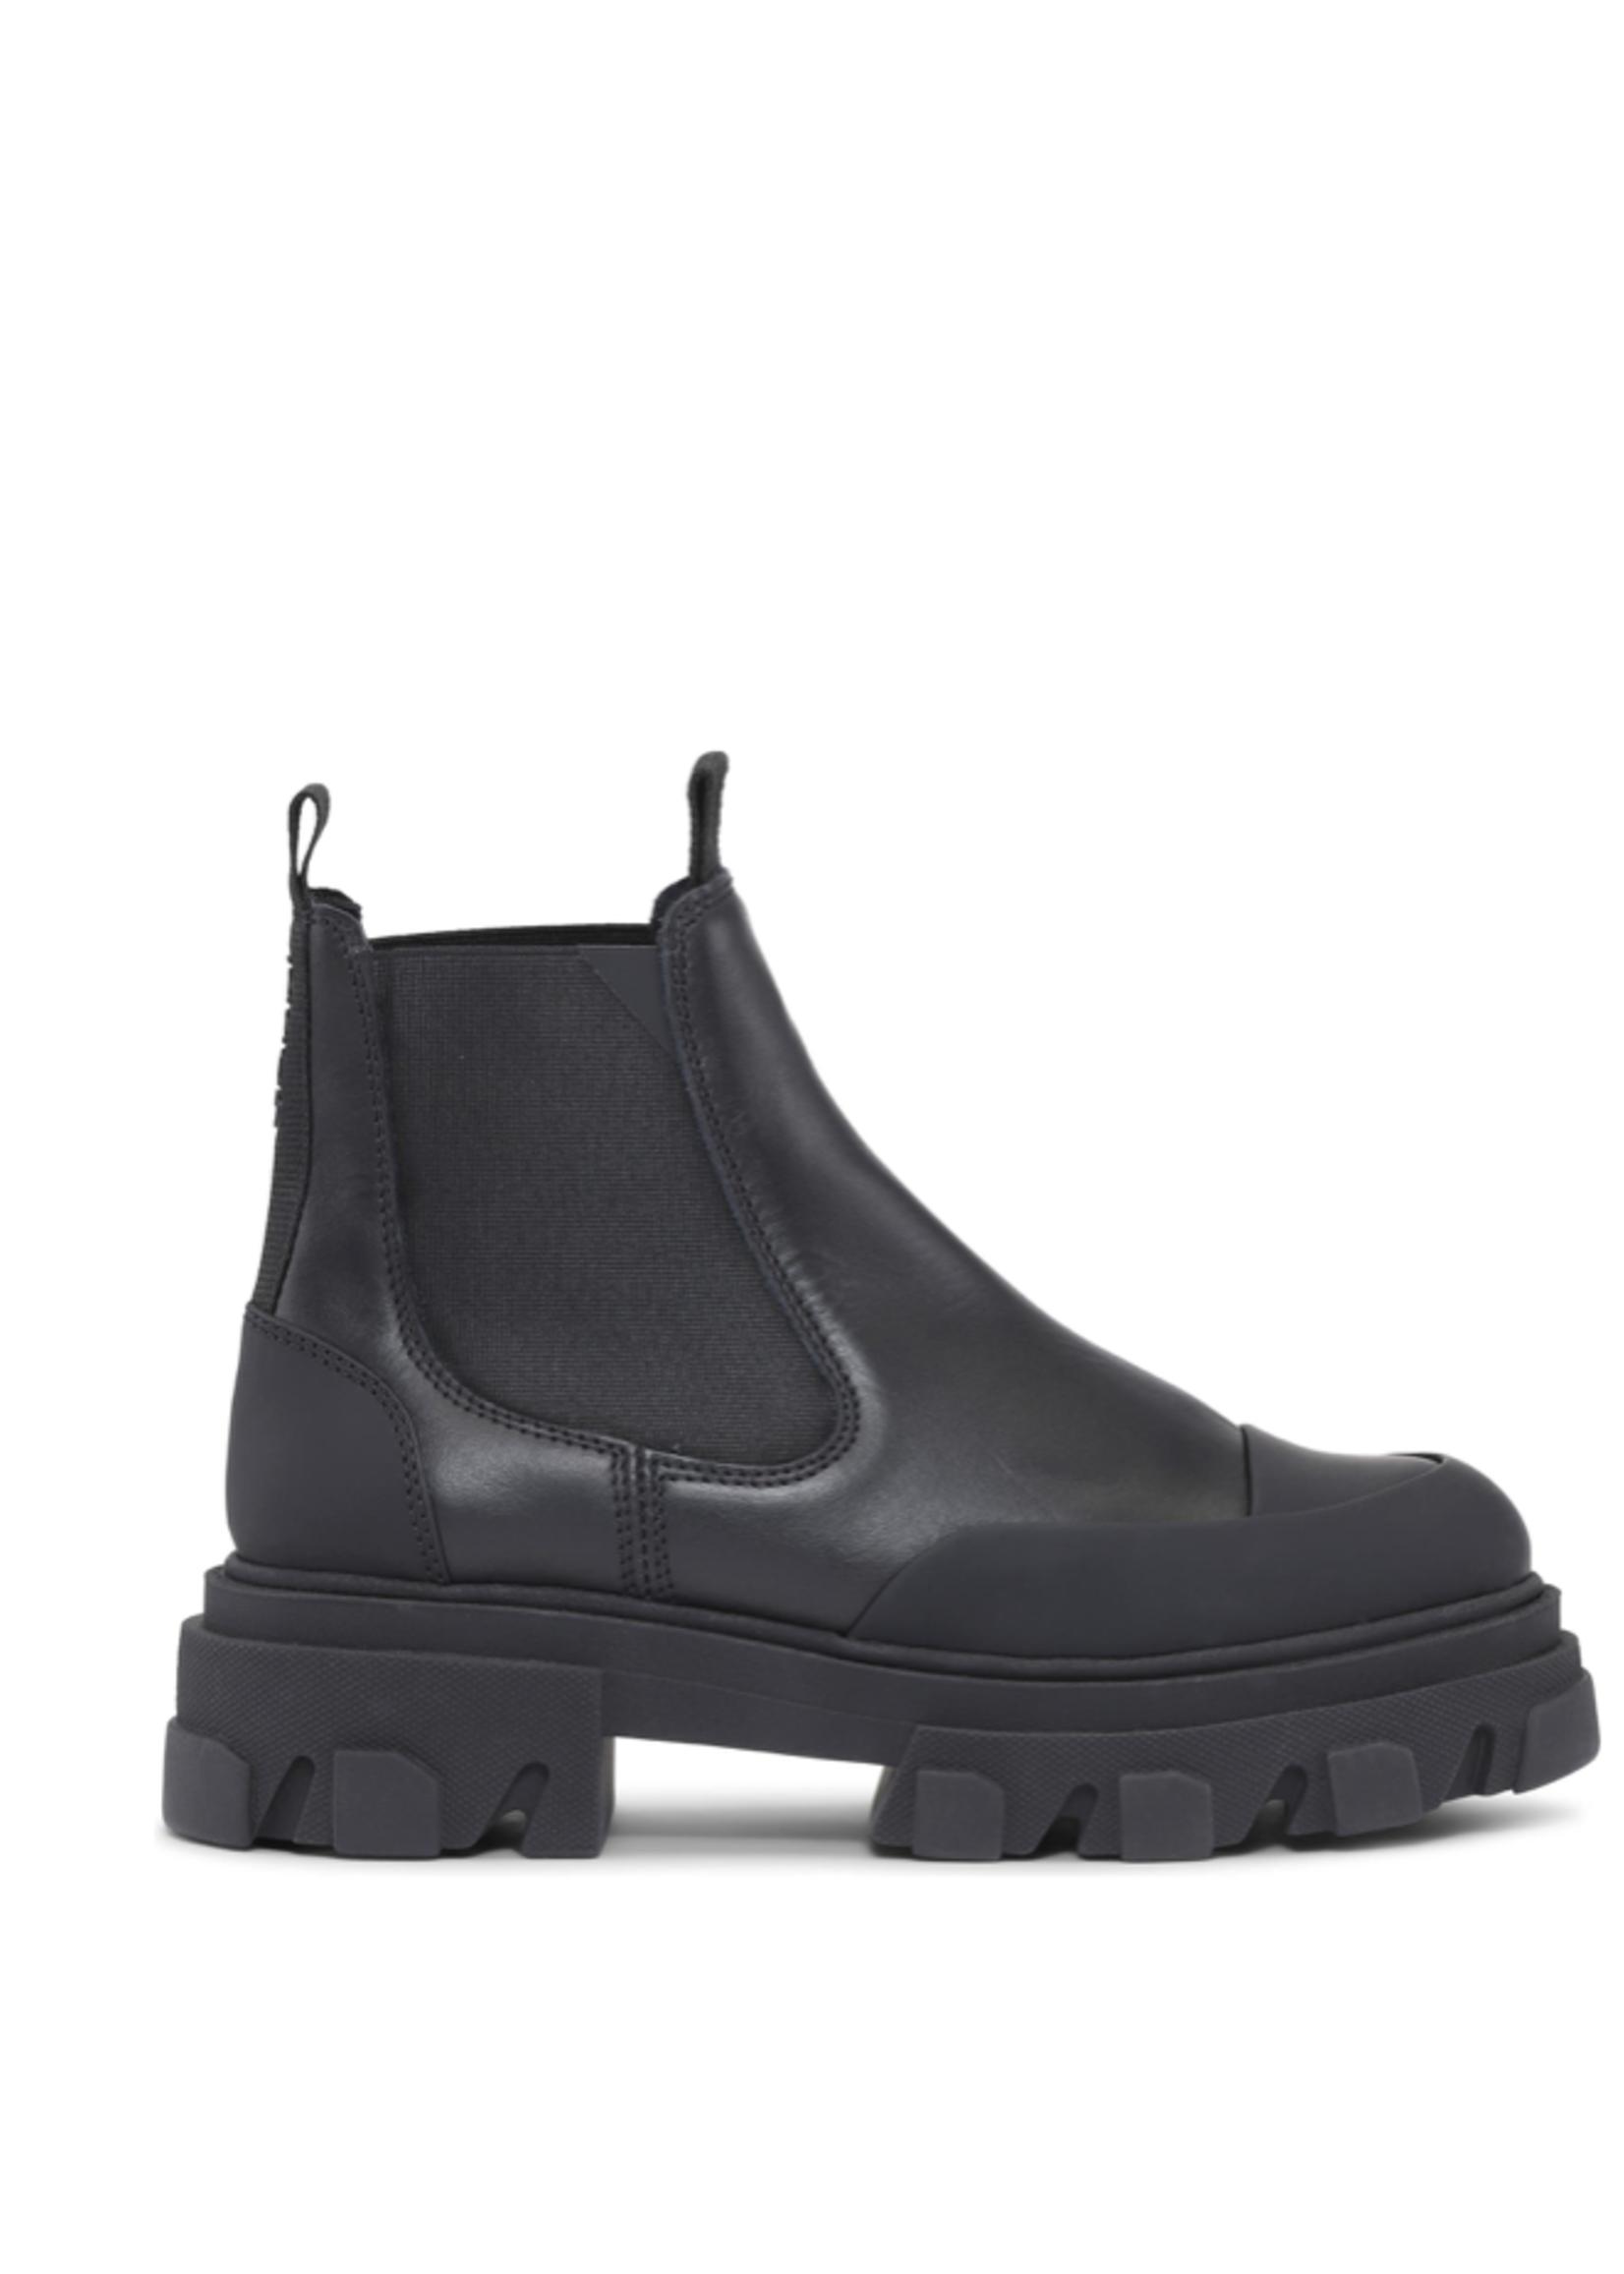 GANNI Low Chelsea Boot in Black